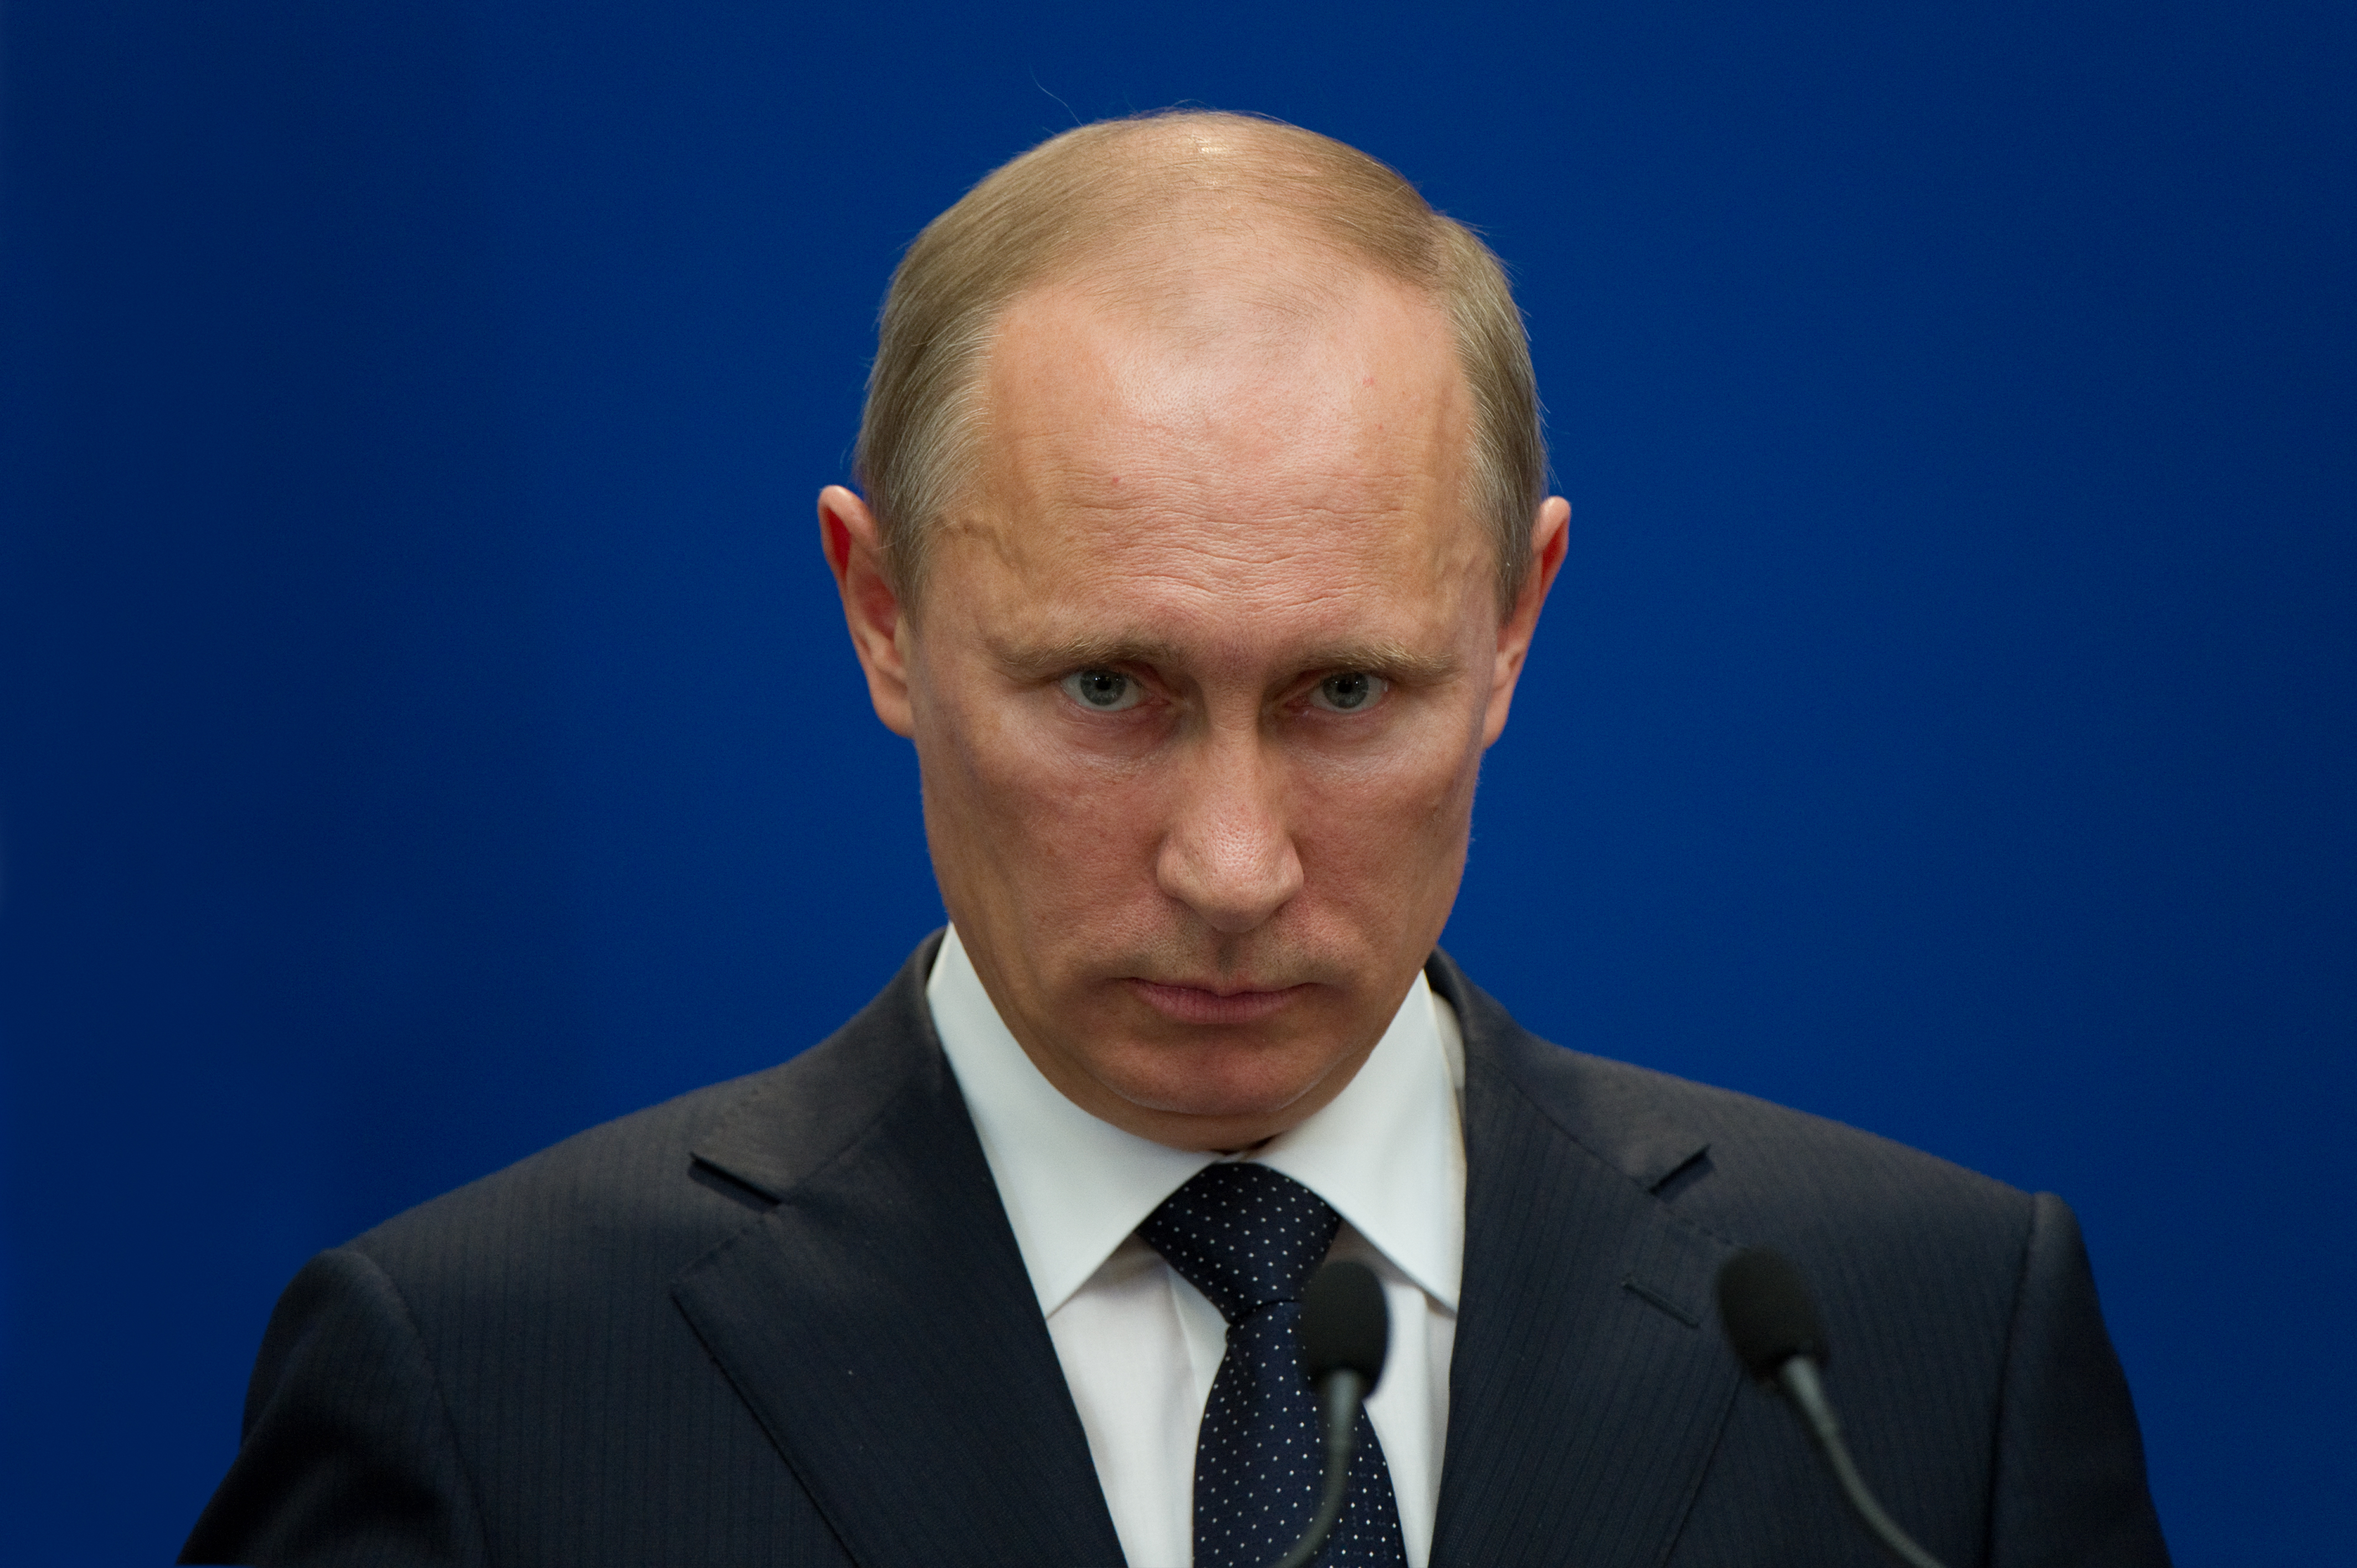 Președintele rus, Vladimir Putin, nemulțumit de extinderea NATO